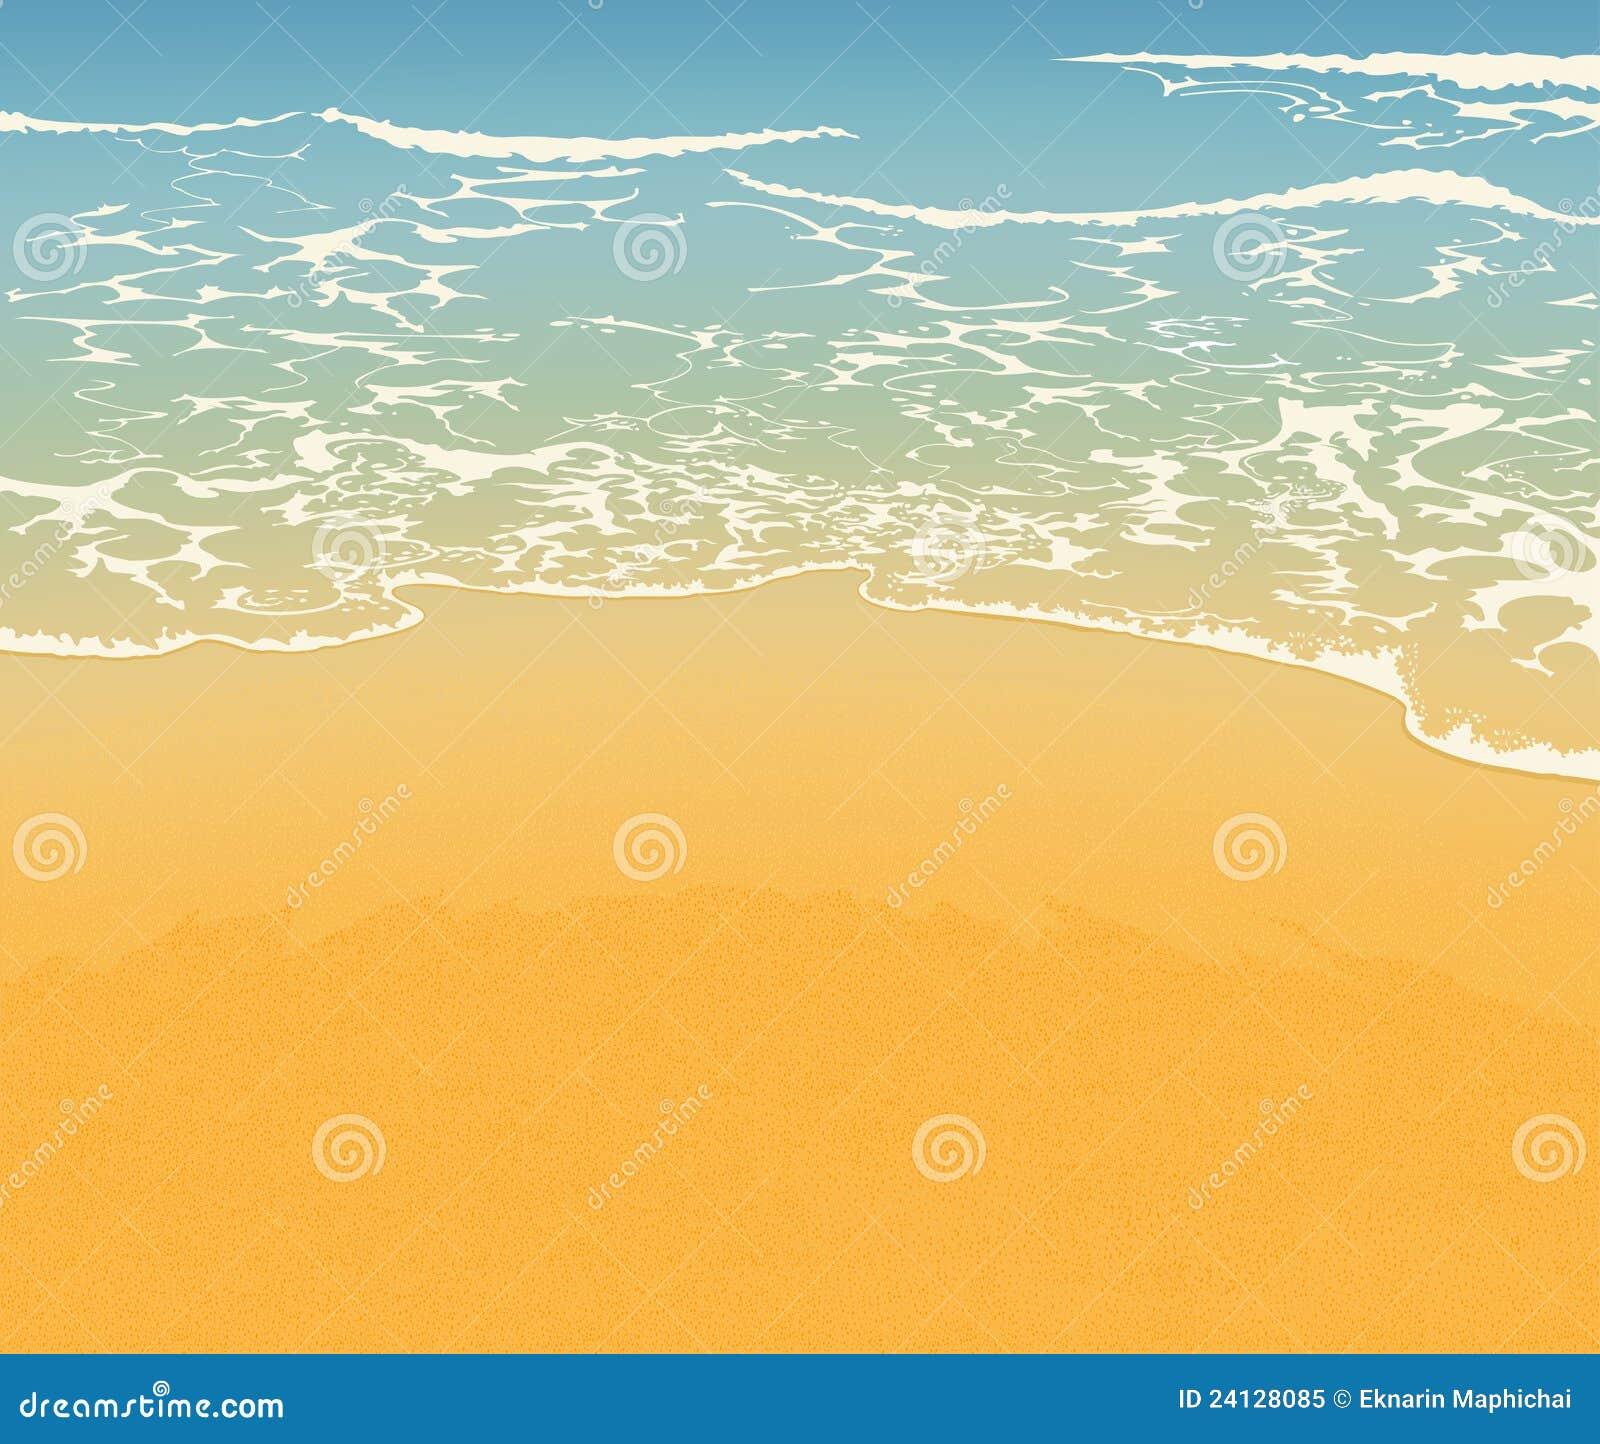 beach and sand stock illustration illustration of wave 24128085 rh dreamstime com Beach Sand Pile Clip Art Beach Scene Clip Art